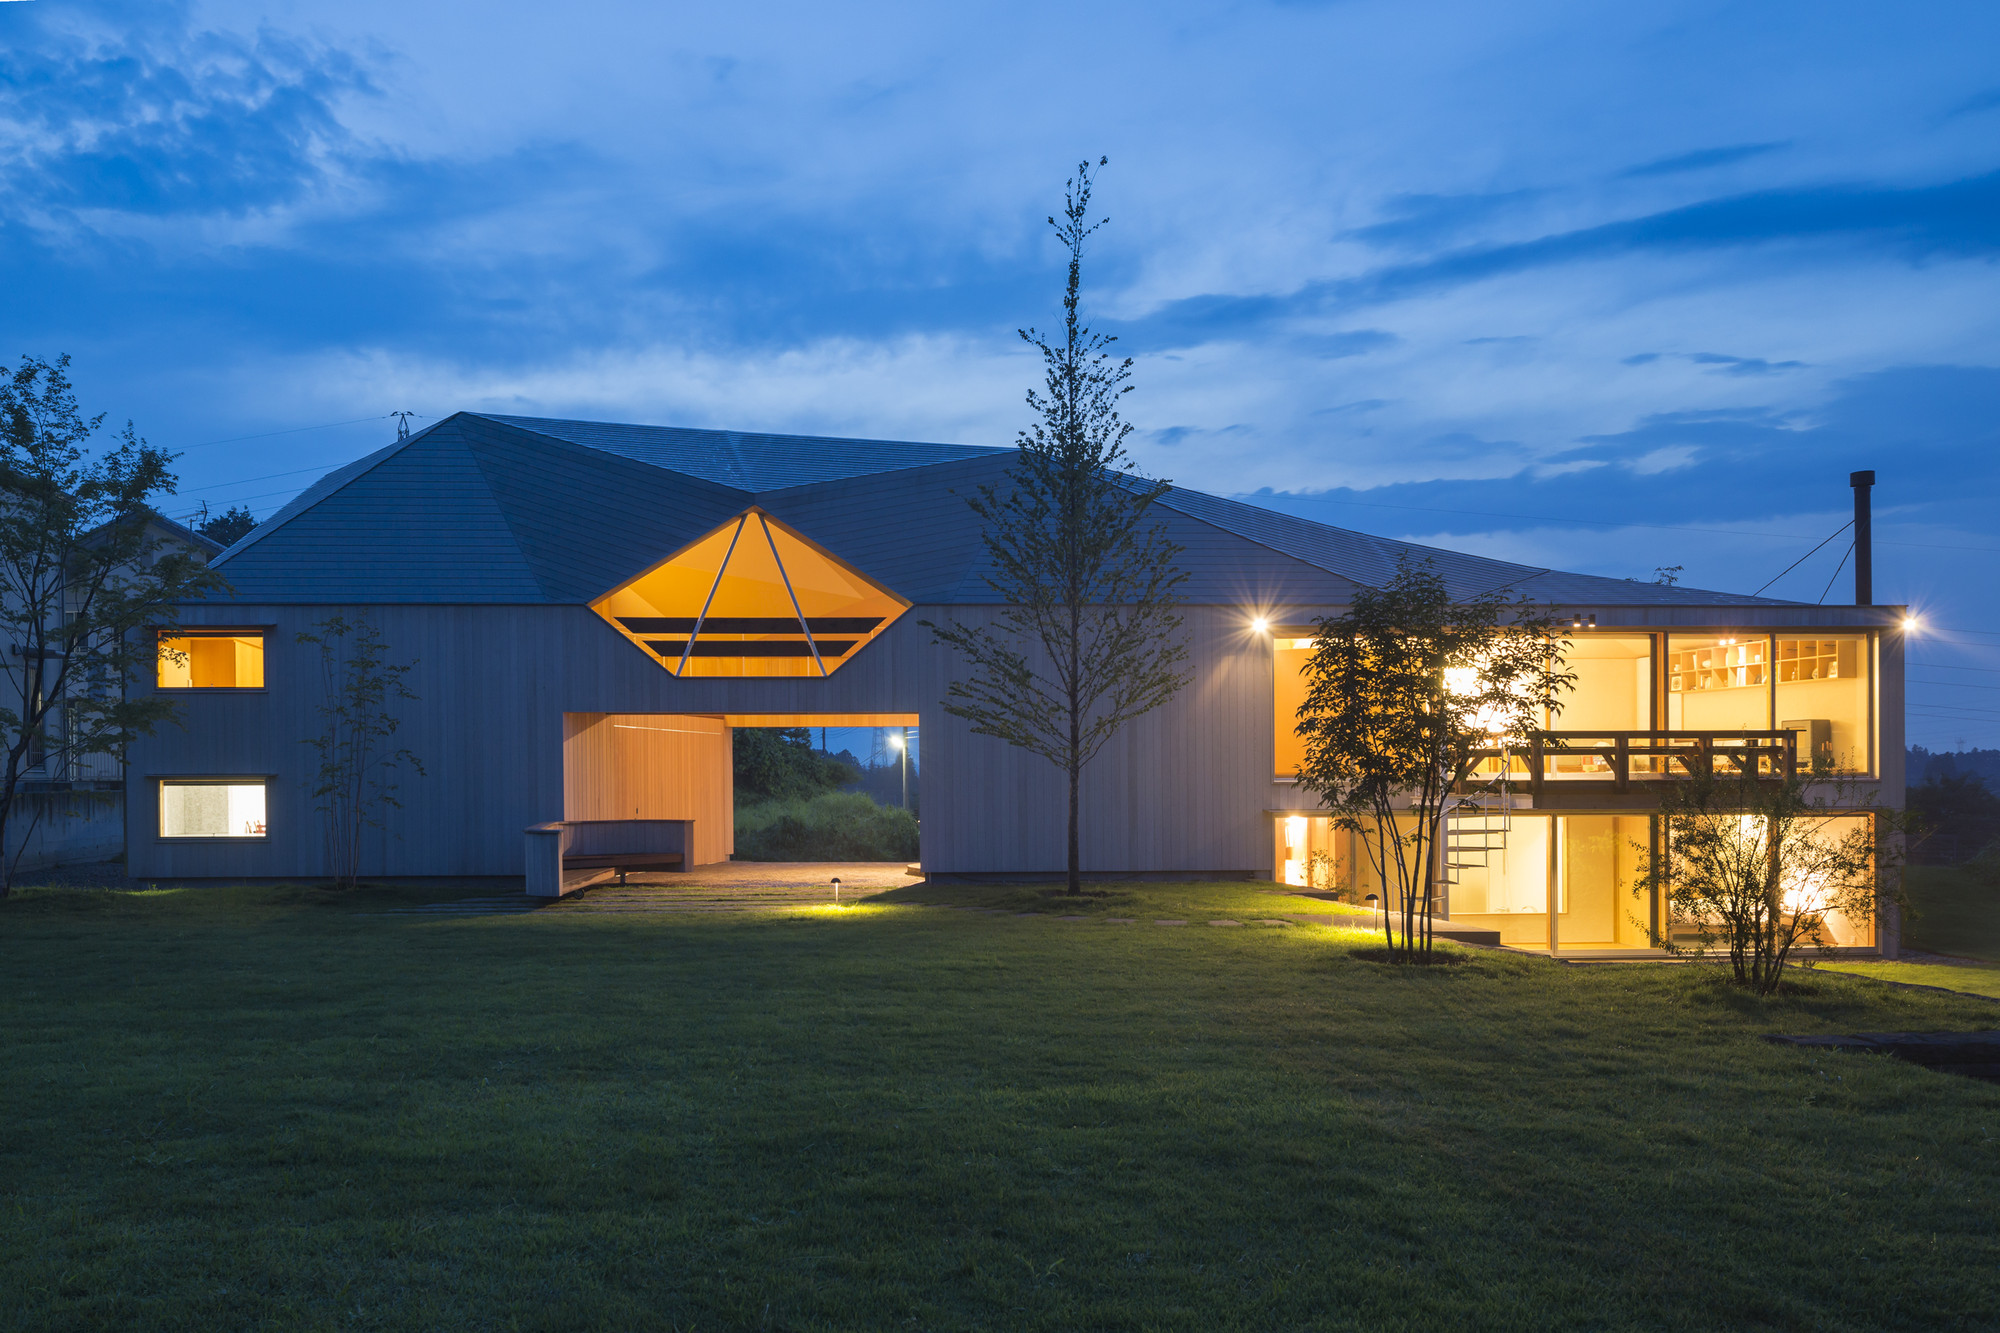 Hayasaka House / Ken Yokogawa Architect & Associates, © Shinkenchiku-sha Co